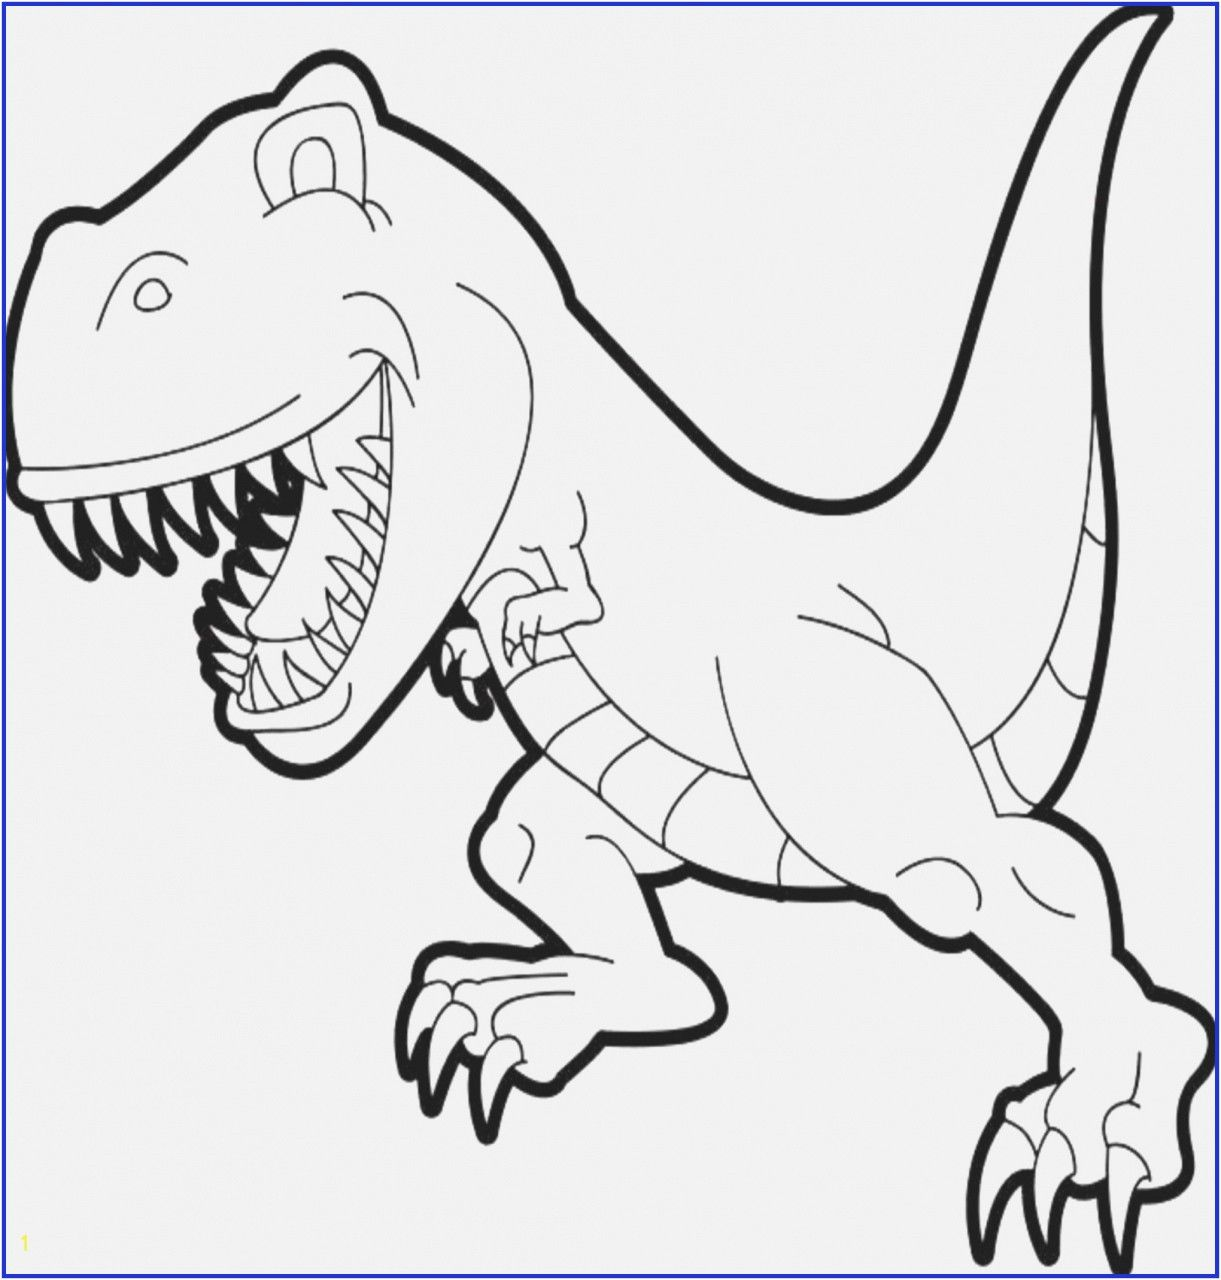 Ausmalbilder Dino , Ausmalbilder Jurassic Park 21 Best